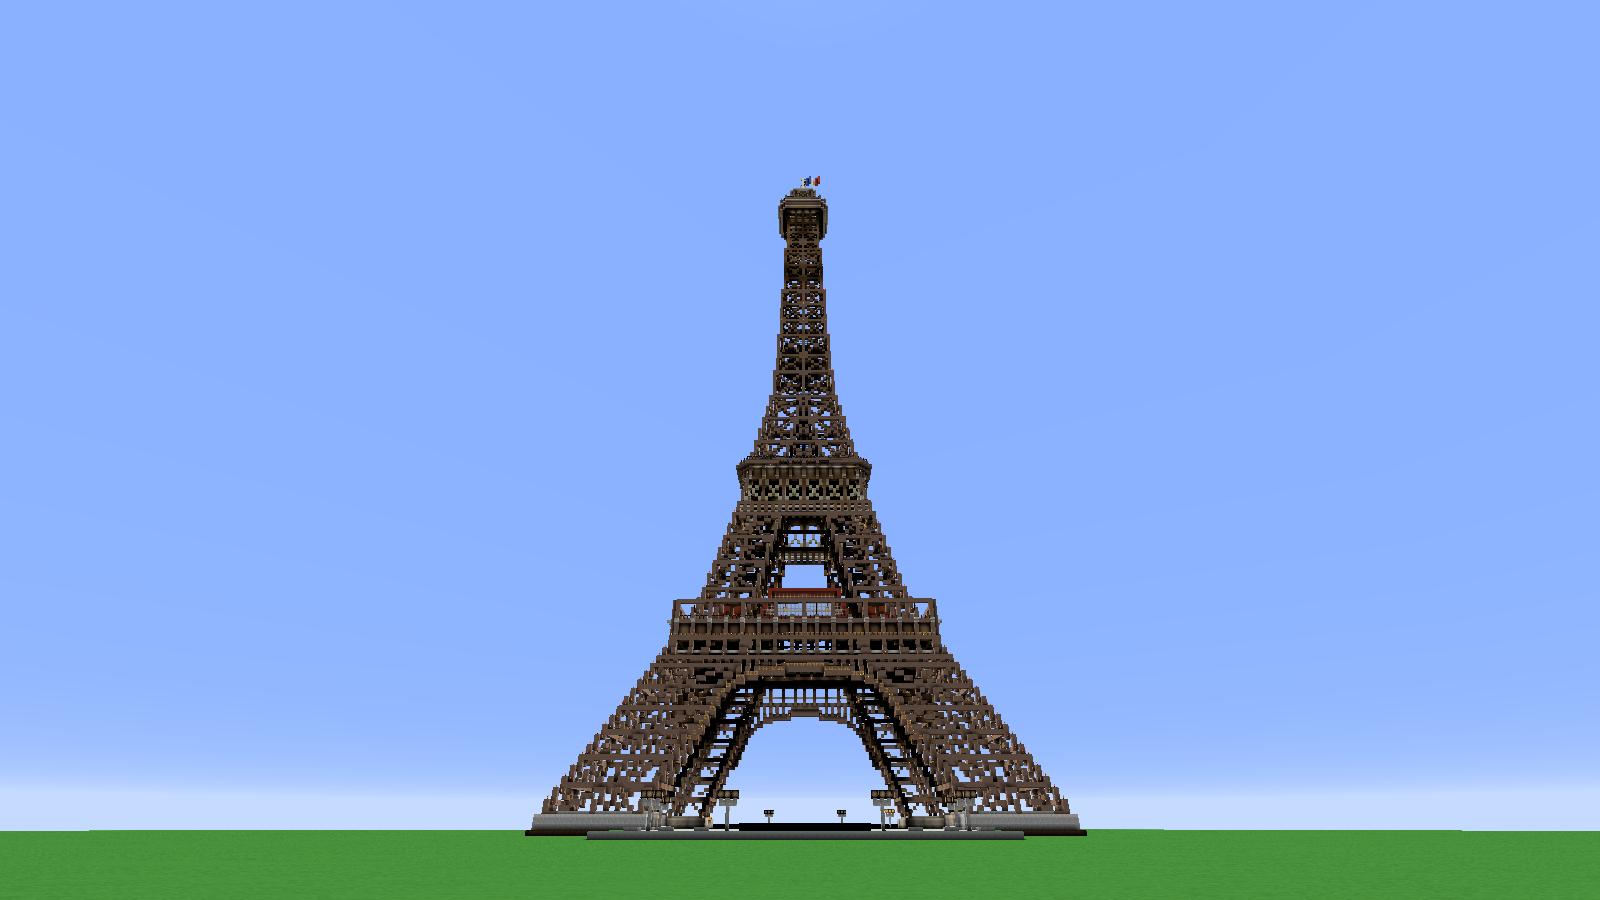 Minecraft architecture special 1000 views eiffel tower for Eiffel architect